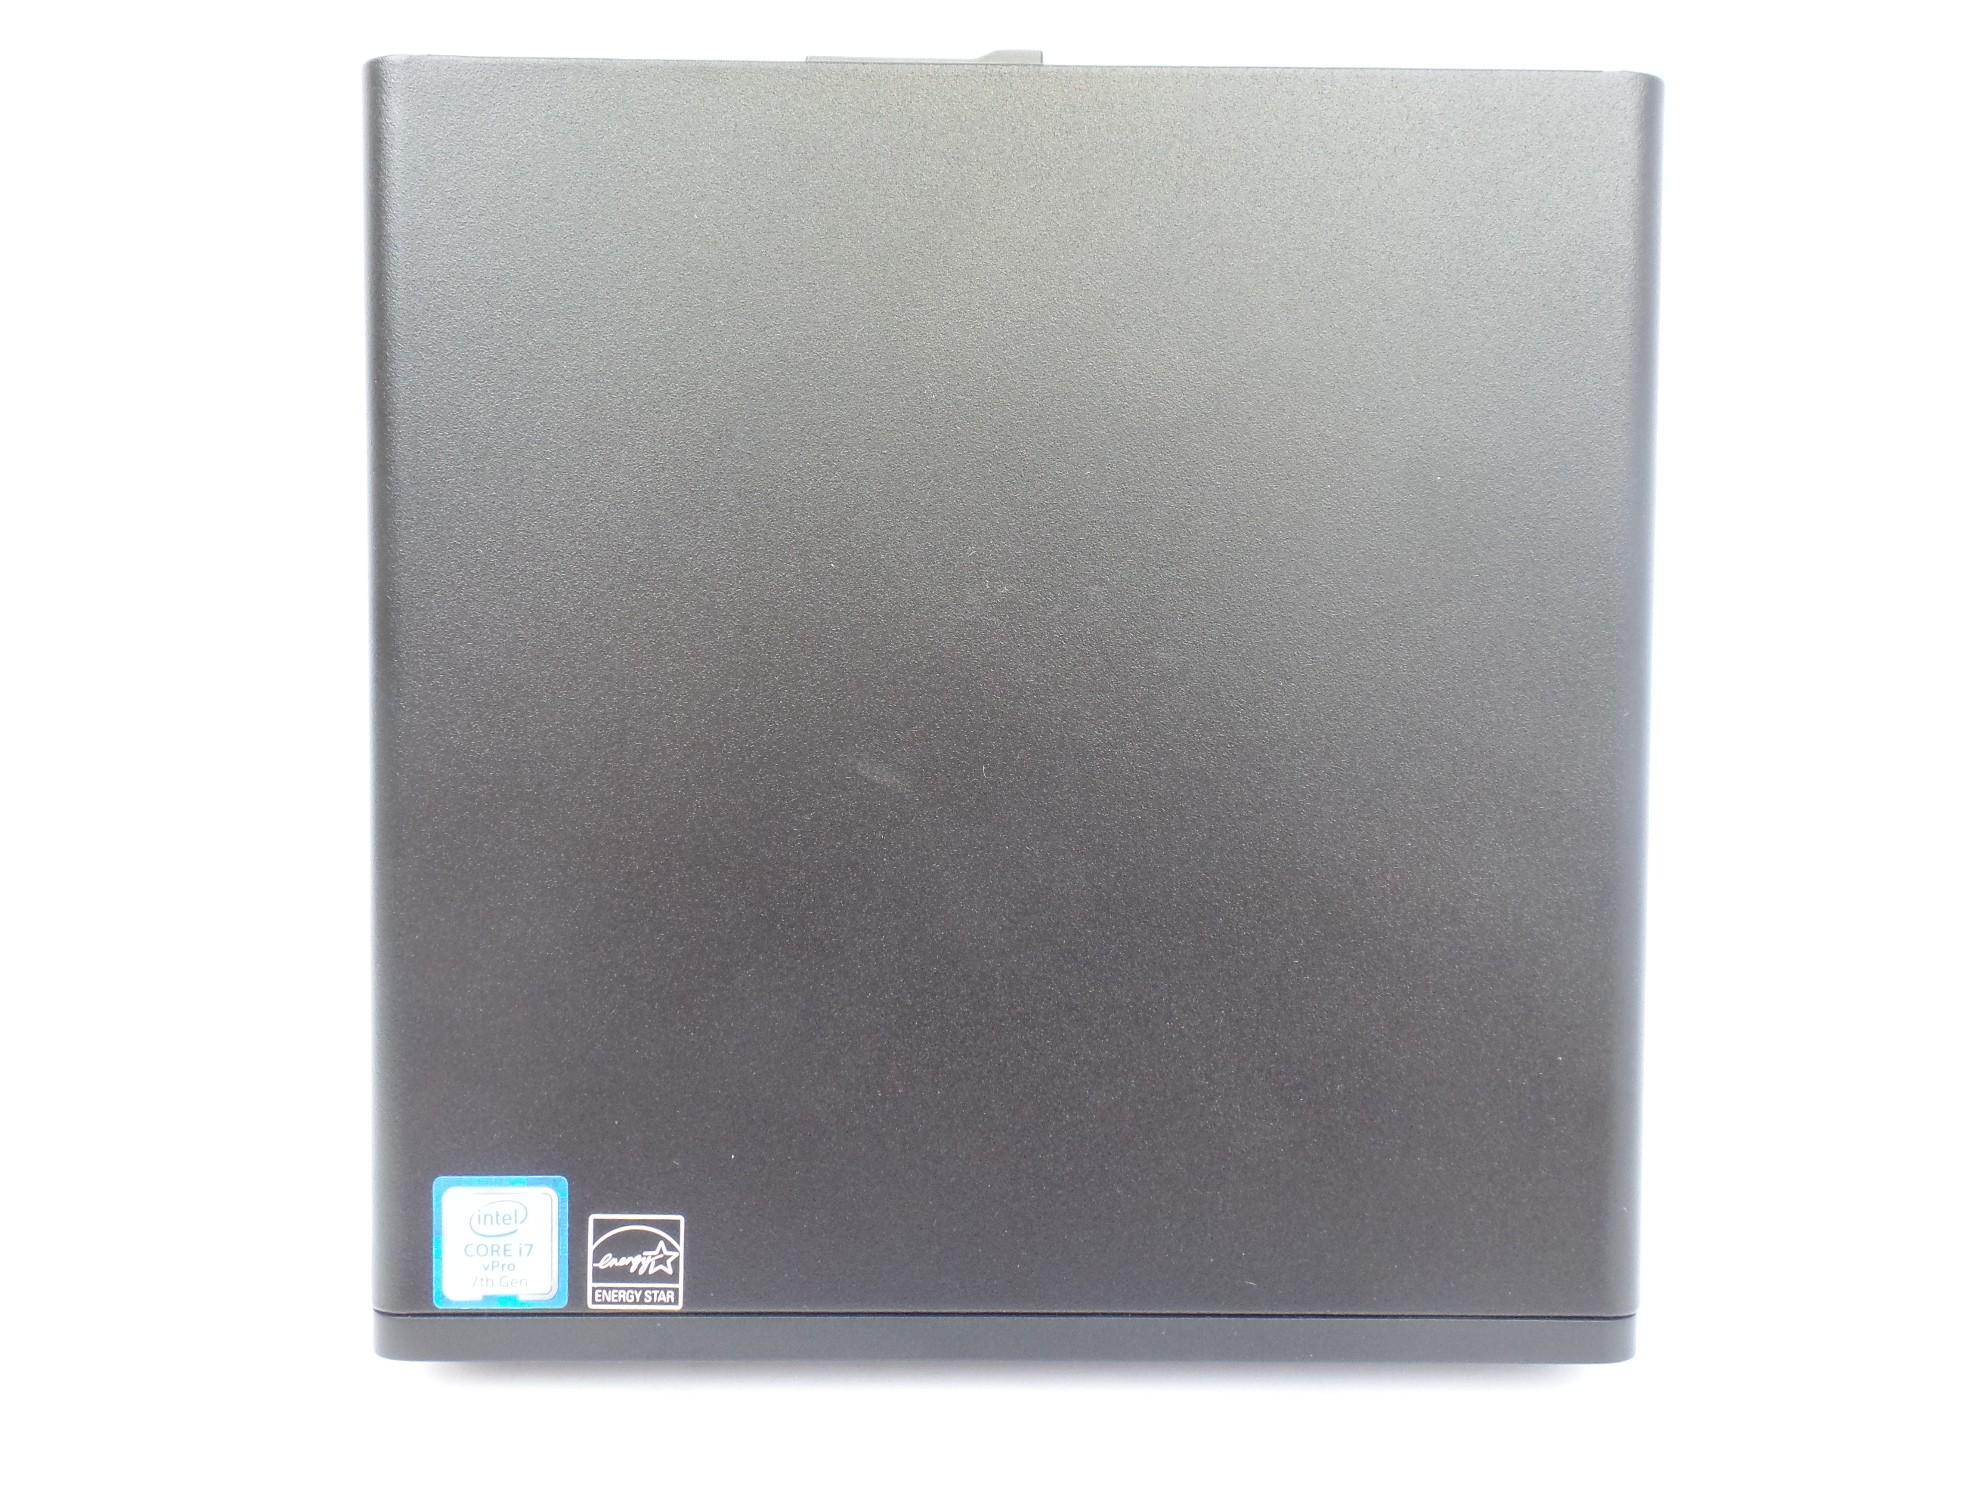 HP EliteDesk 800 G3 Mini PC i7-7700T 2 9GHz 16GB 256GB SSD W10P 2SW13U8  Tiny OB